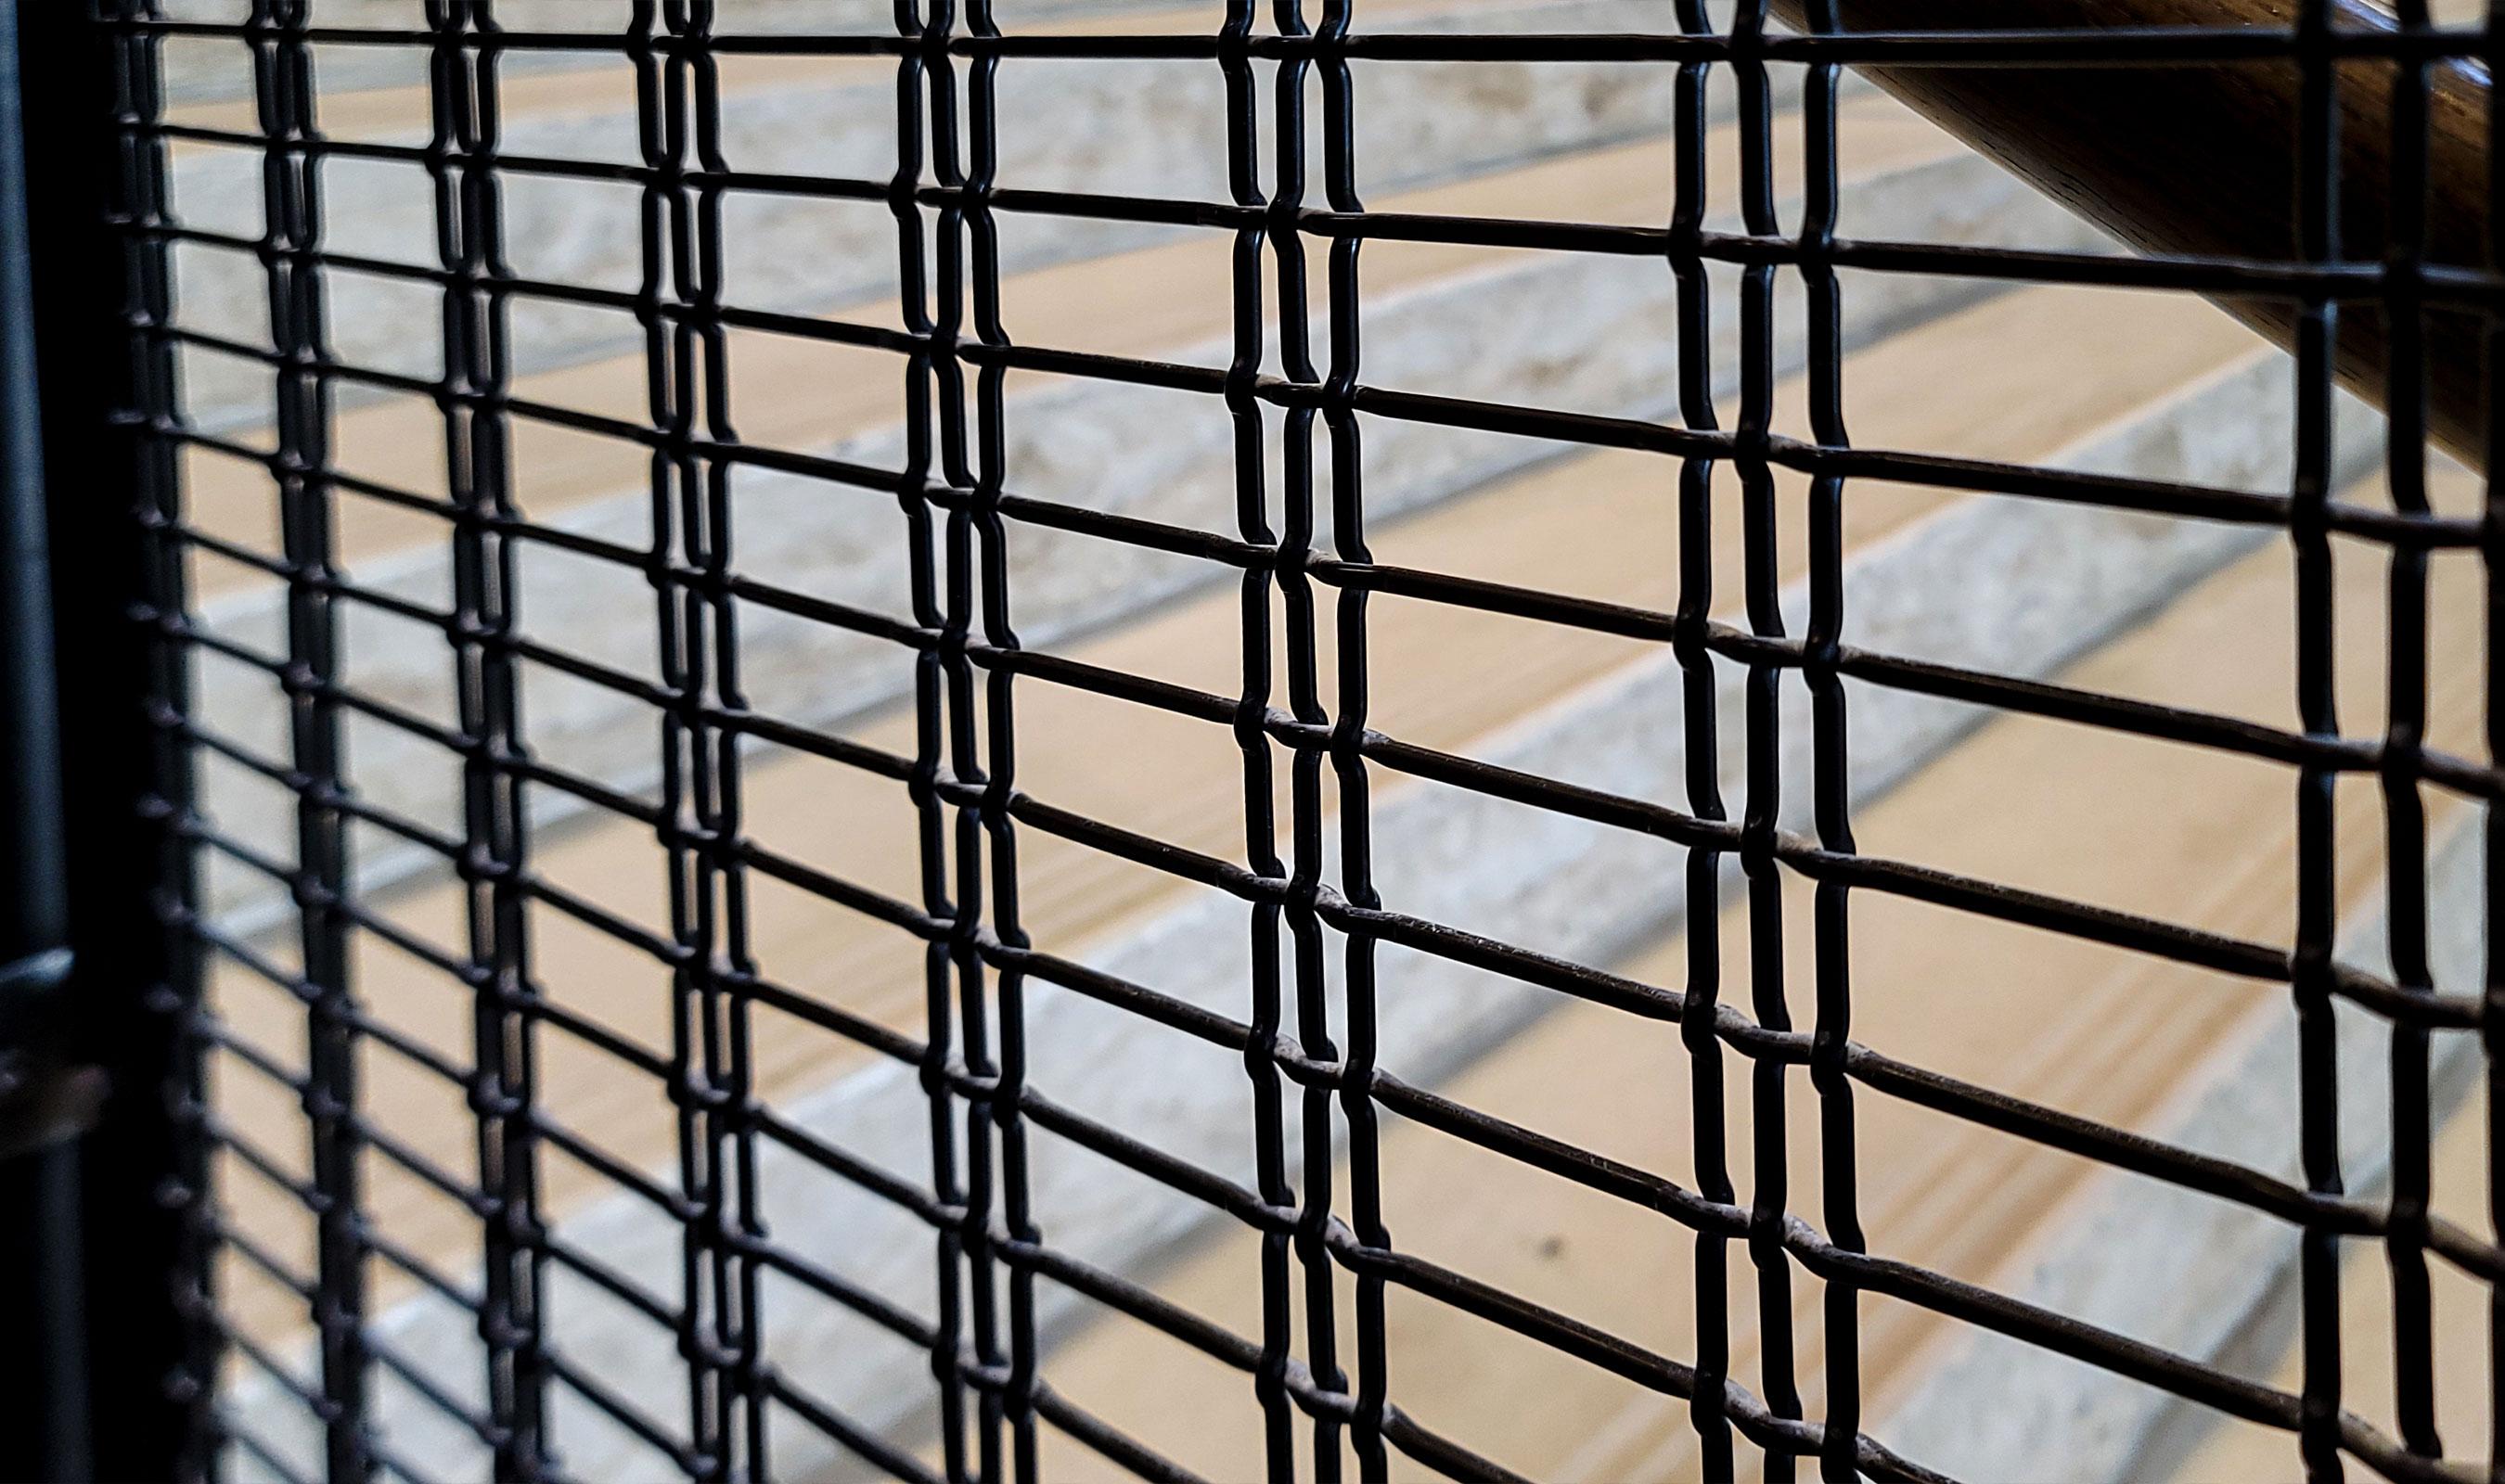 Woven wire mesh pattern M13Z-146 is a triple shute pattern with a horizontal flow.